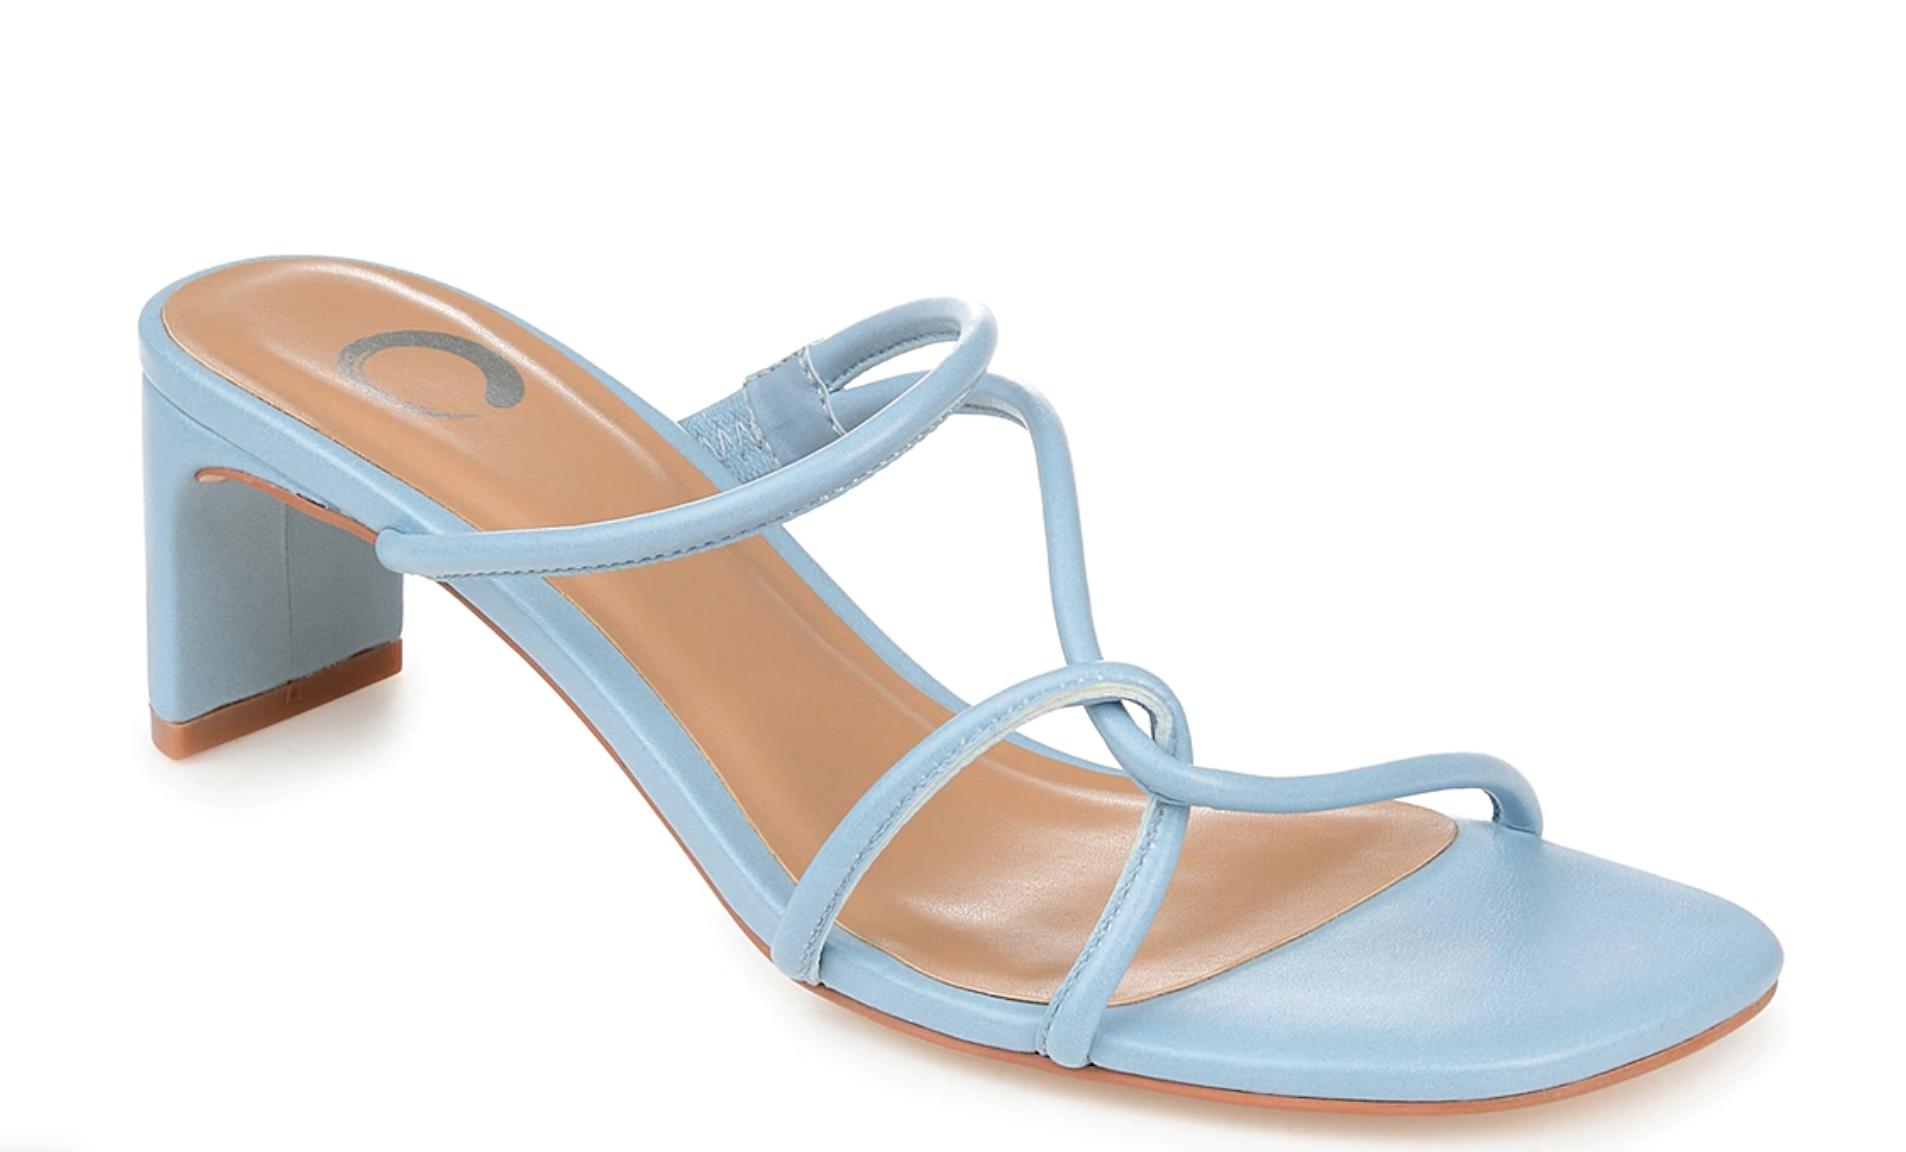 journee zapatos azul tacon